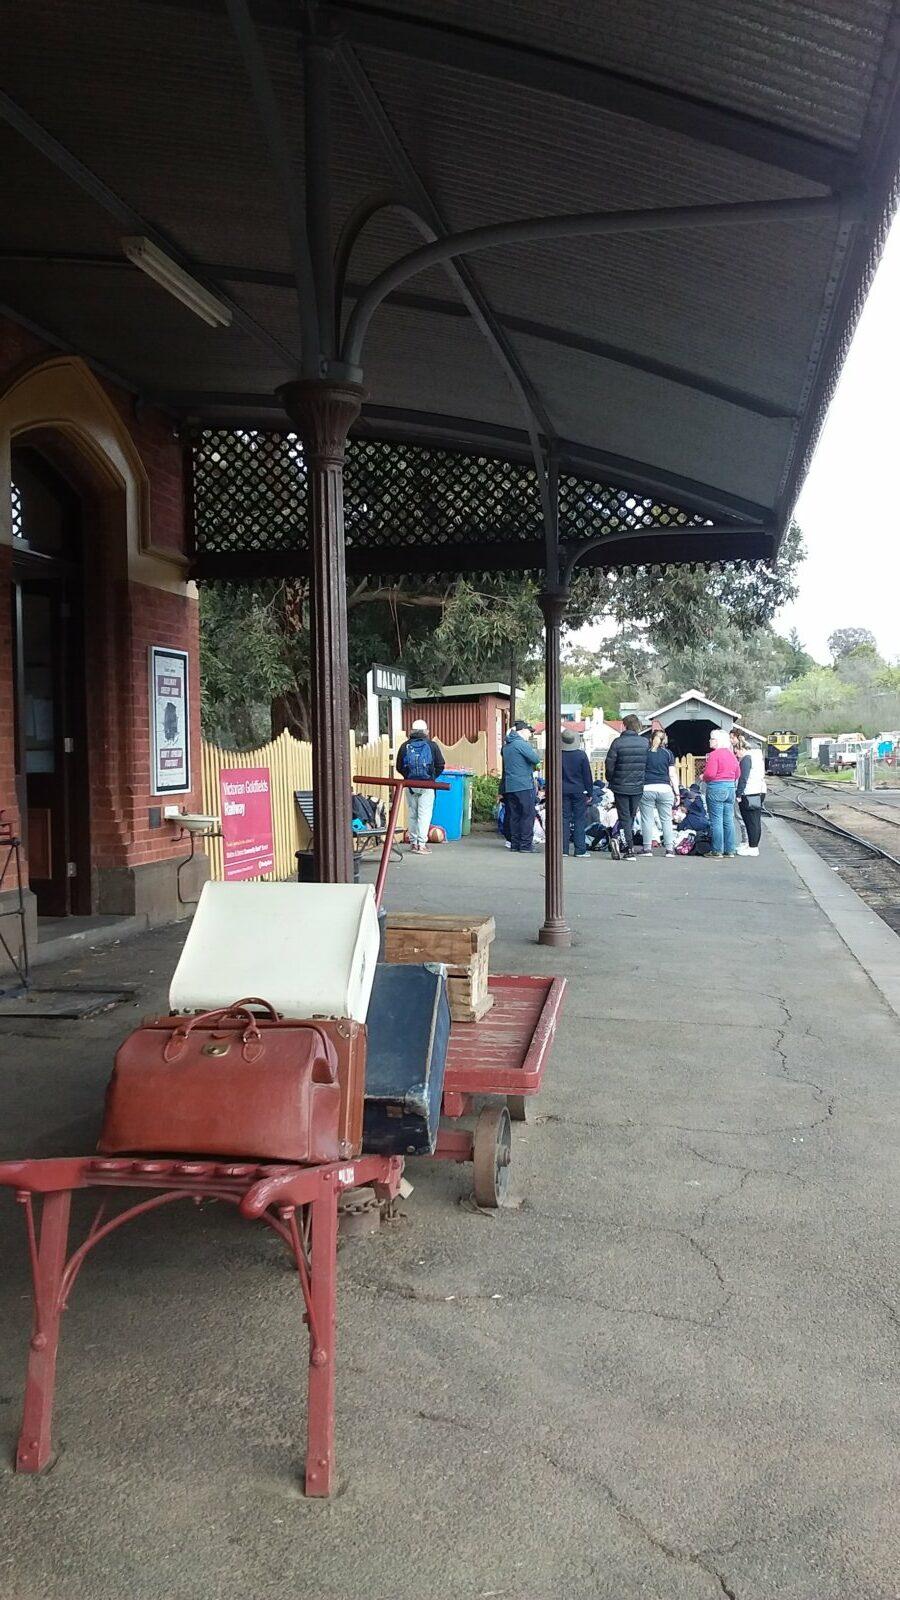 Maldon Station